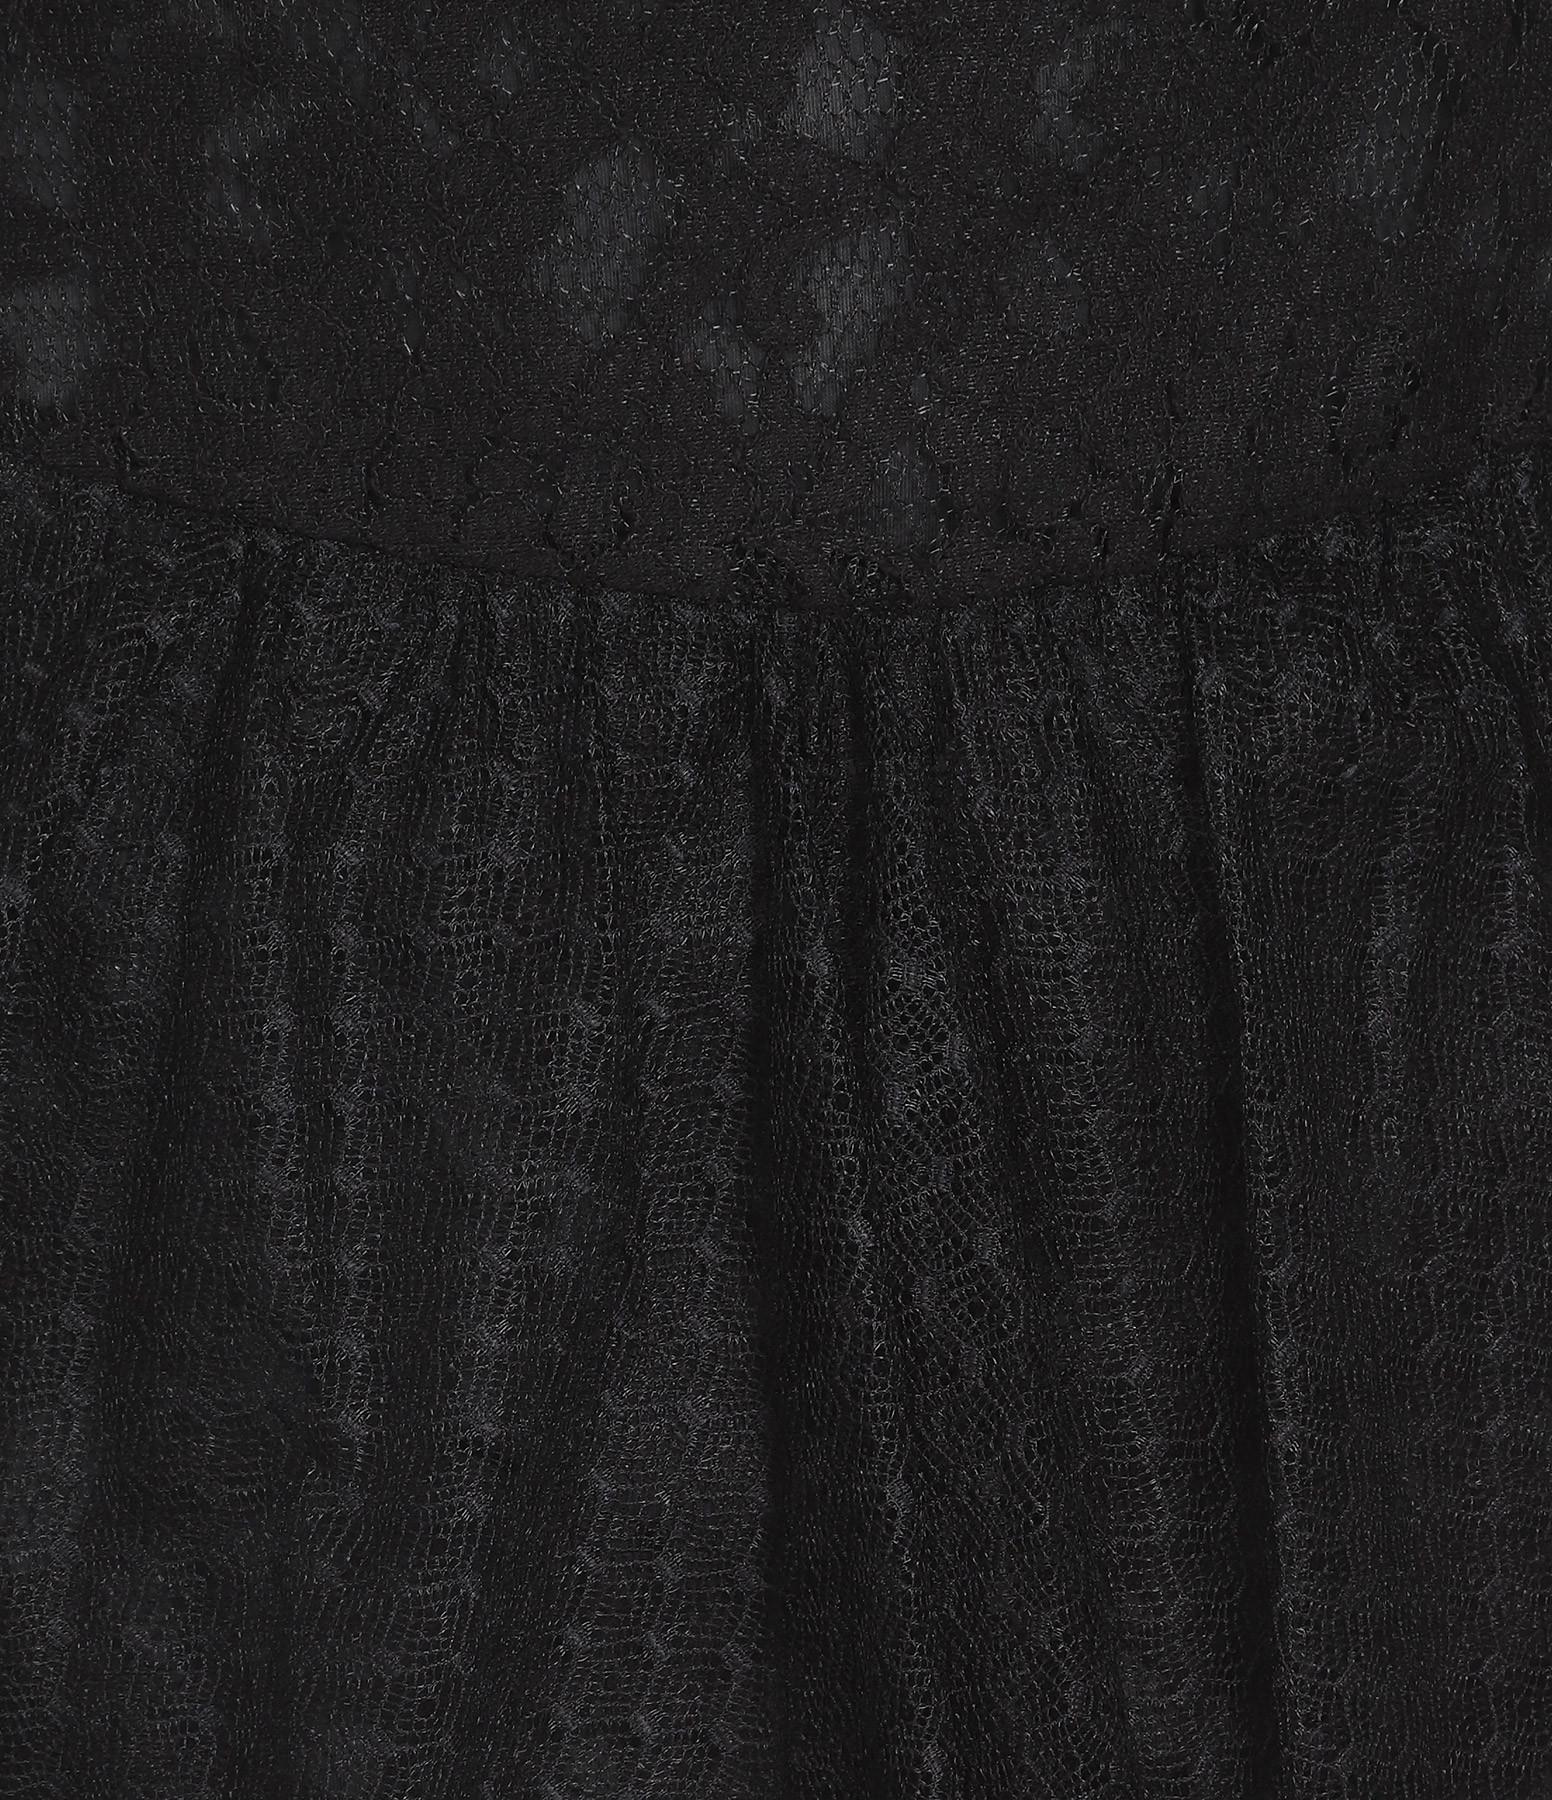 SEE BY CHLOE - Jupe Volants Noir